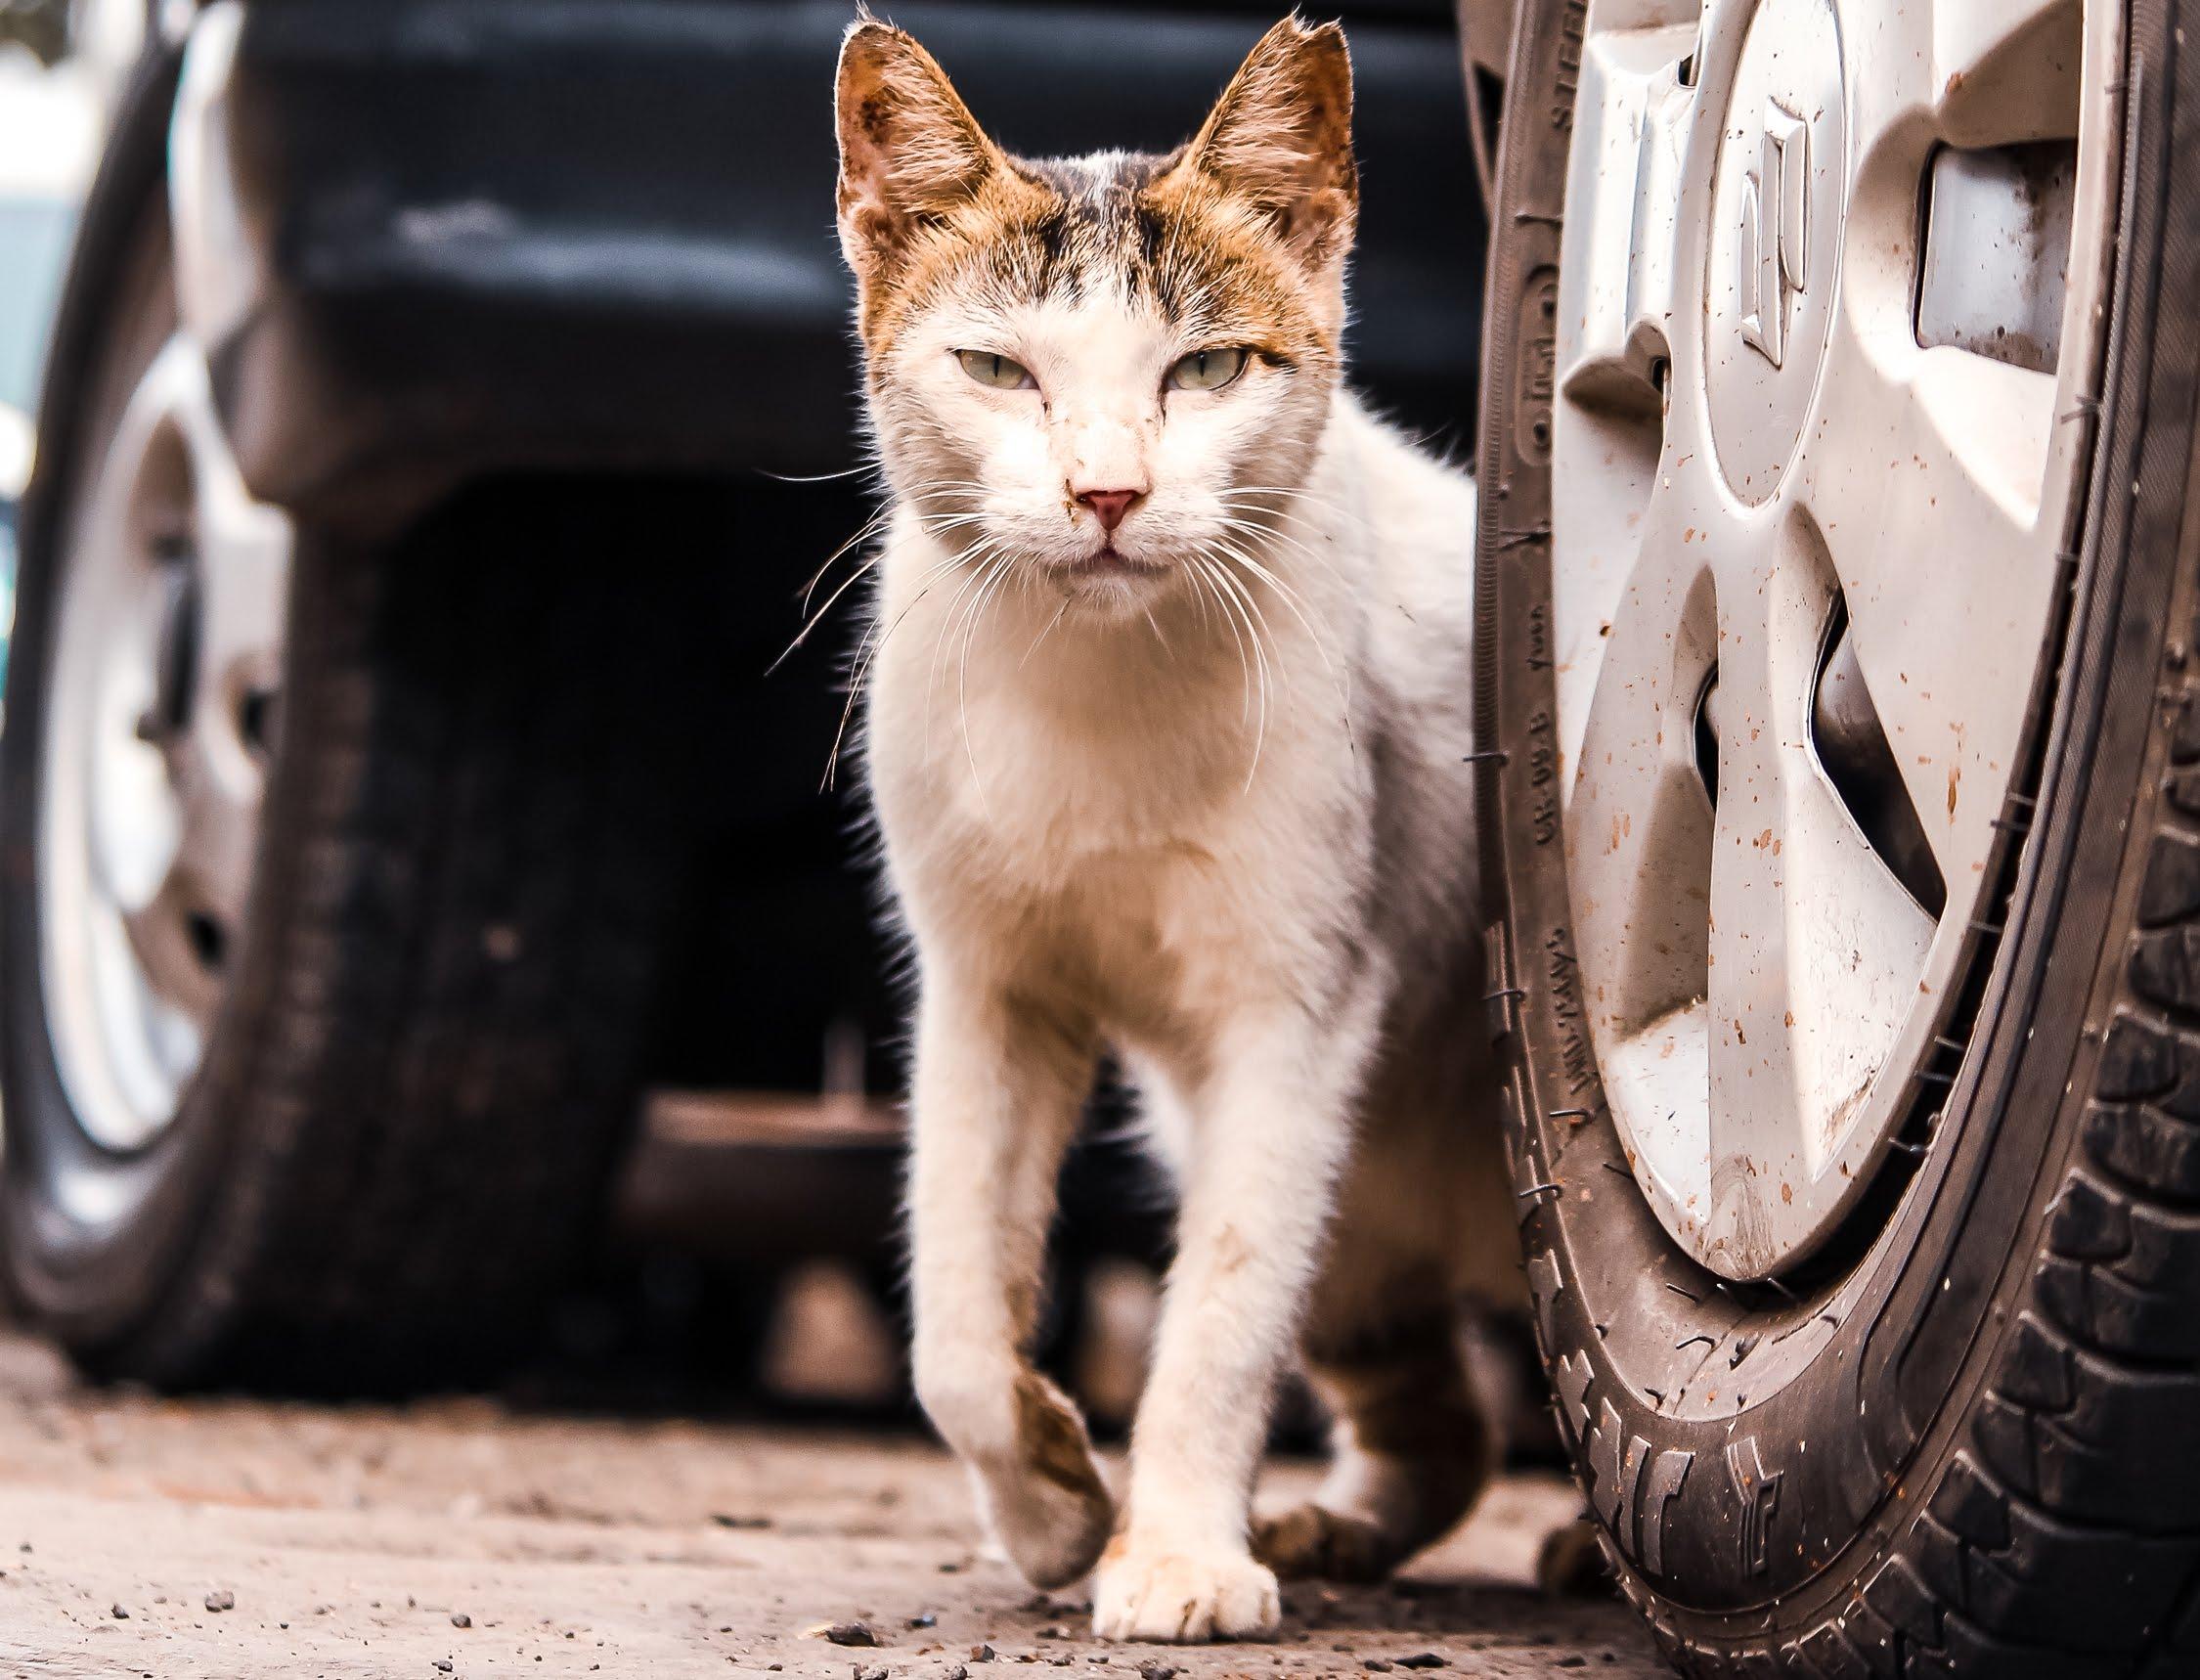 Street Cat next to a Car